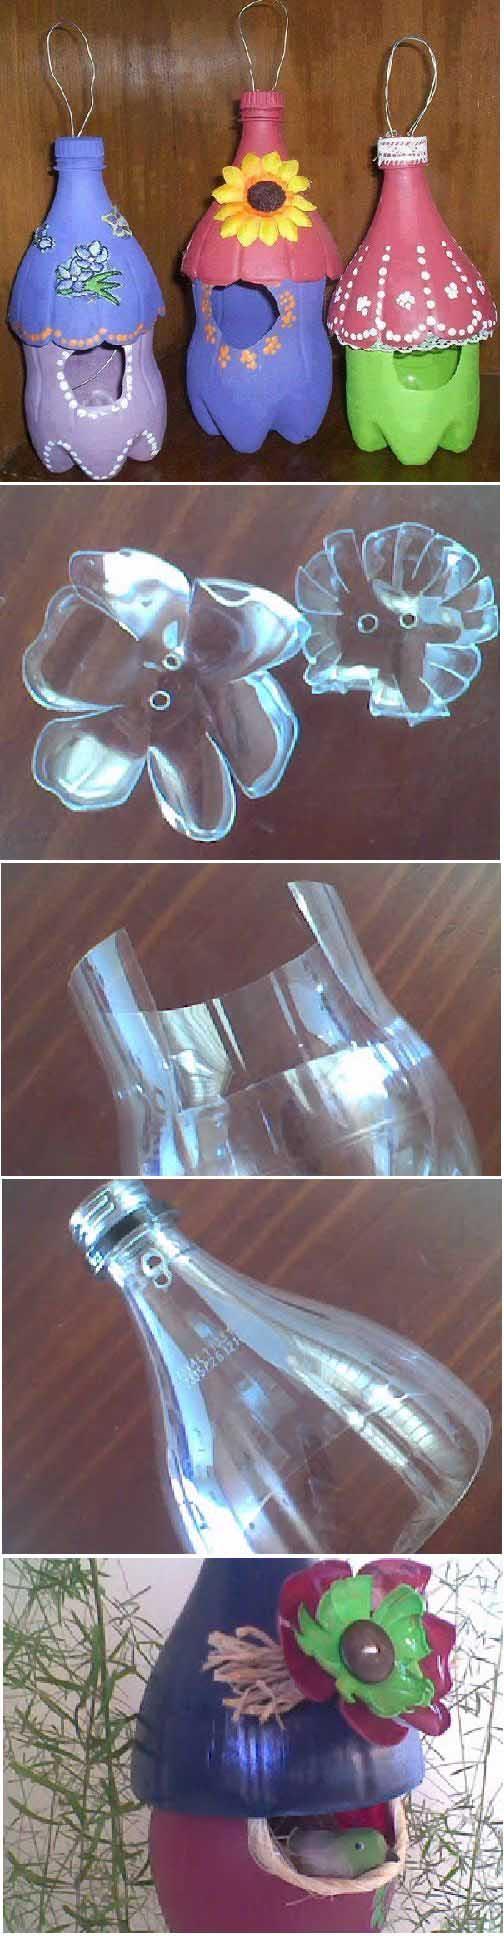 reciclar_garrafas_plastico_8